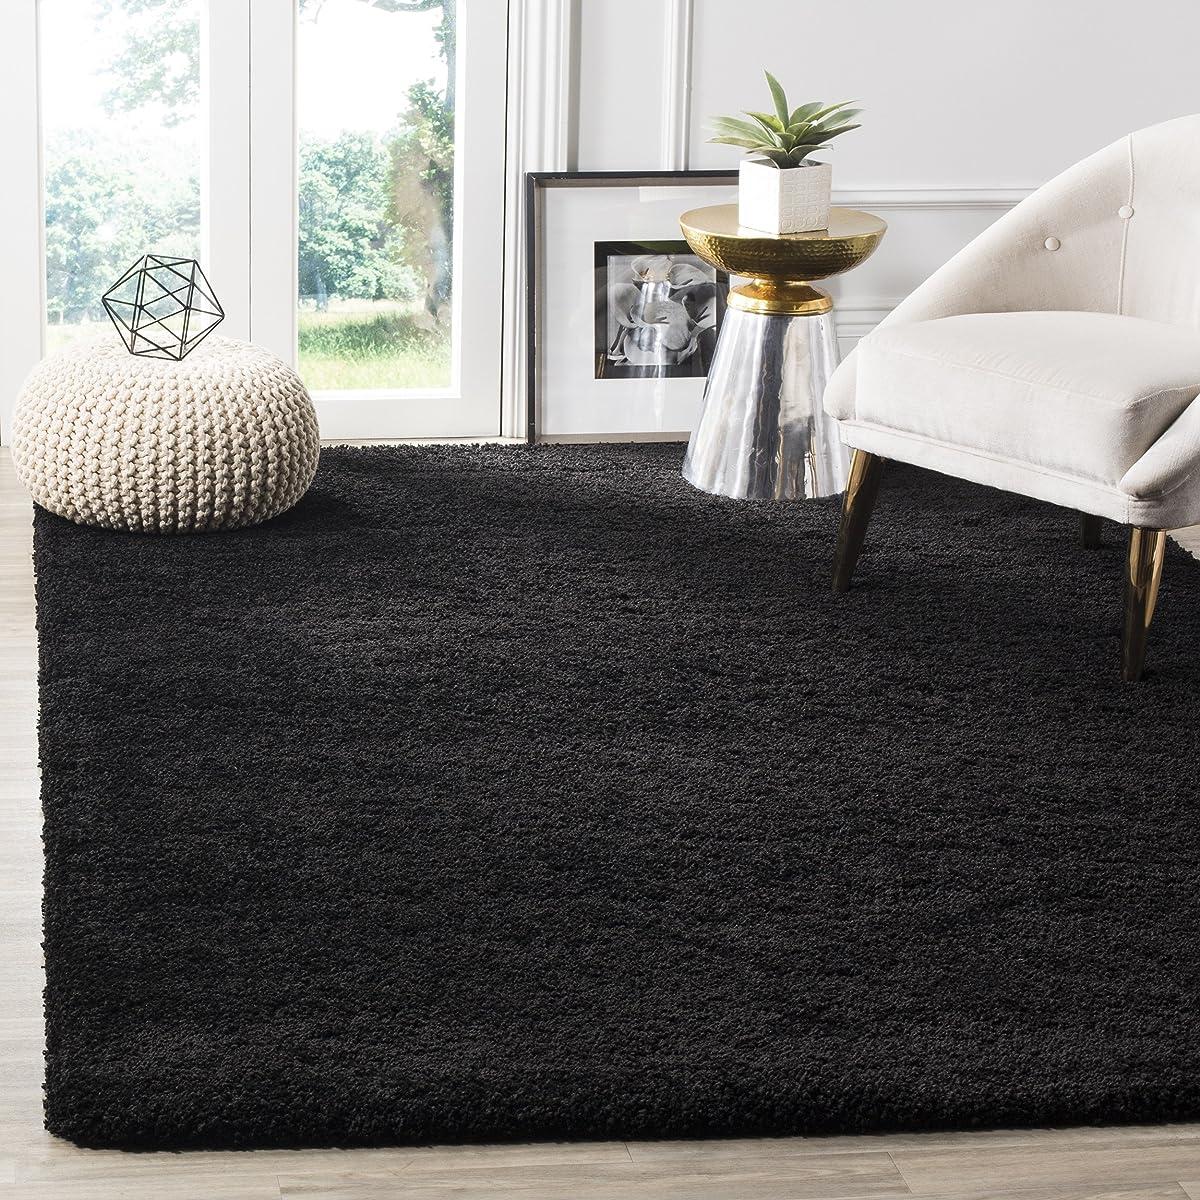 Safavieh Milan Shag Collection SG180-9090 Black Area Rug (4 x 6)